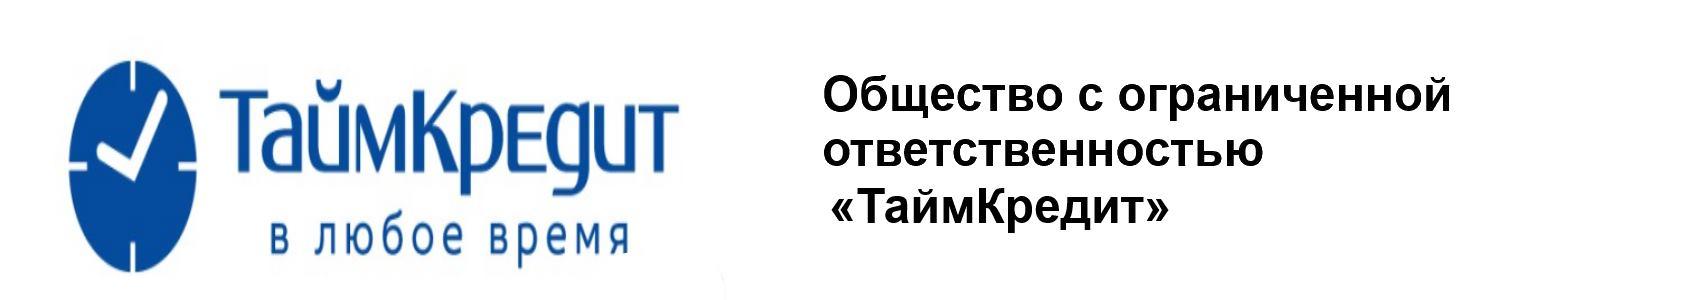 ТаймКредит